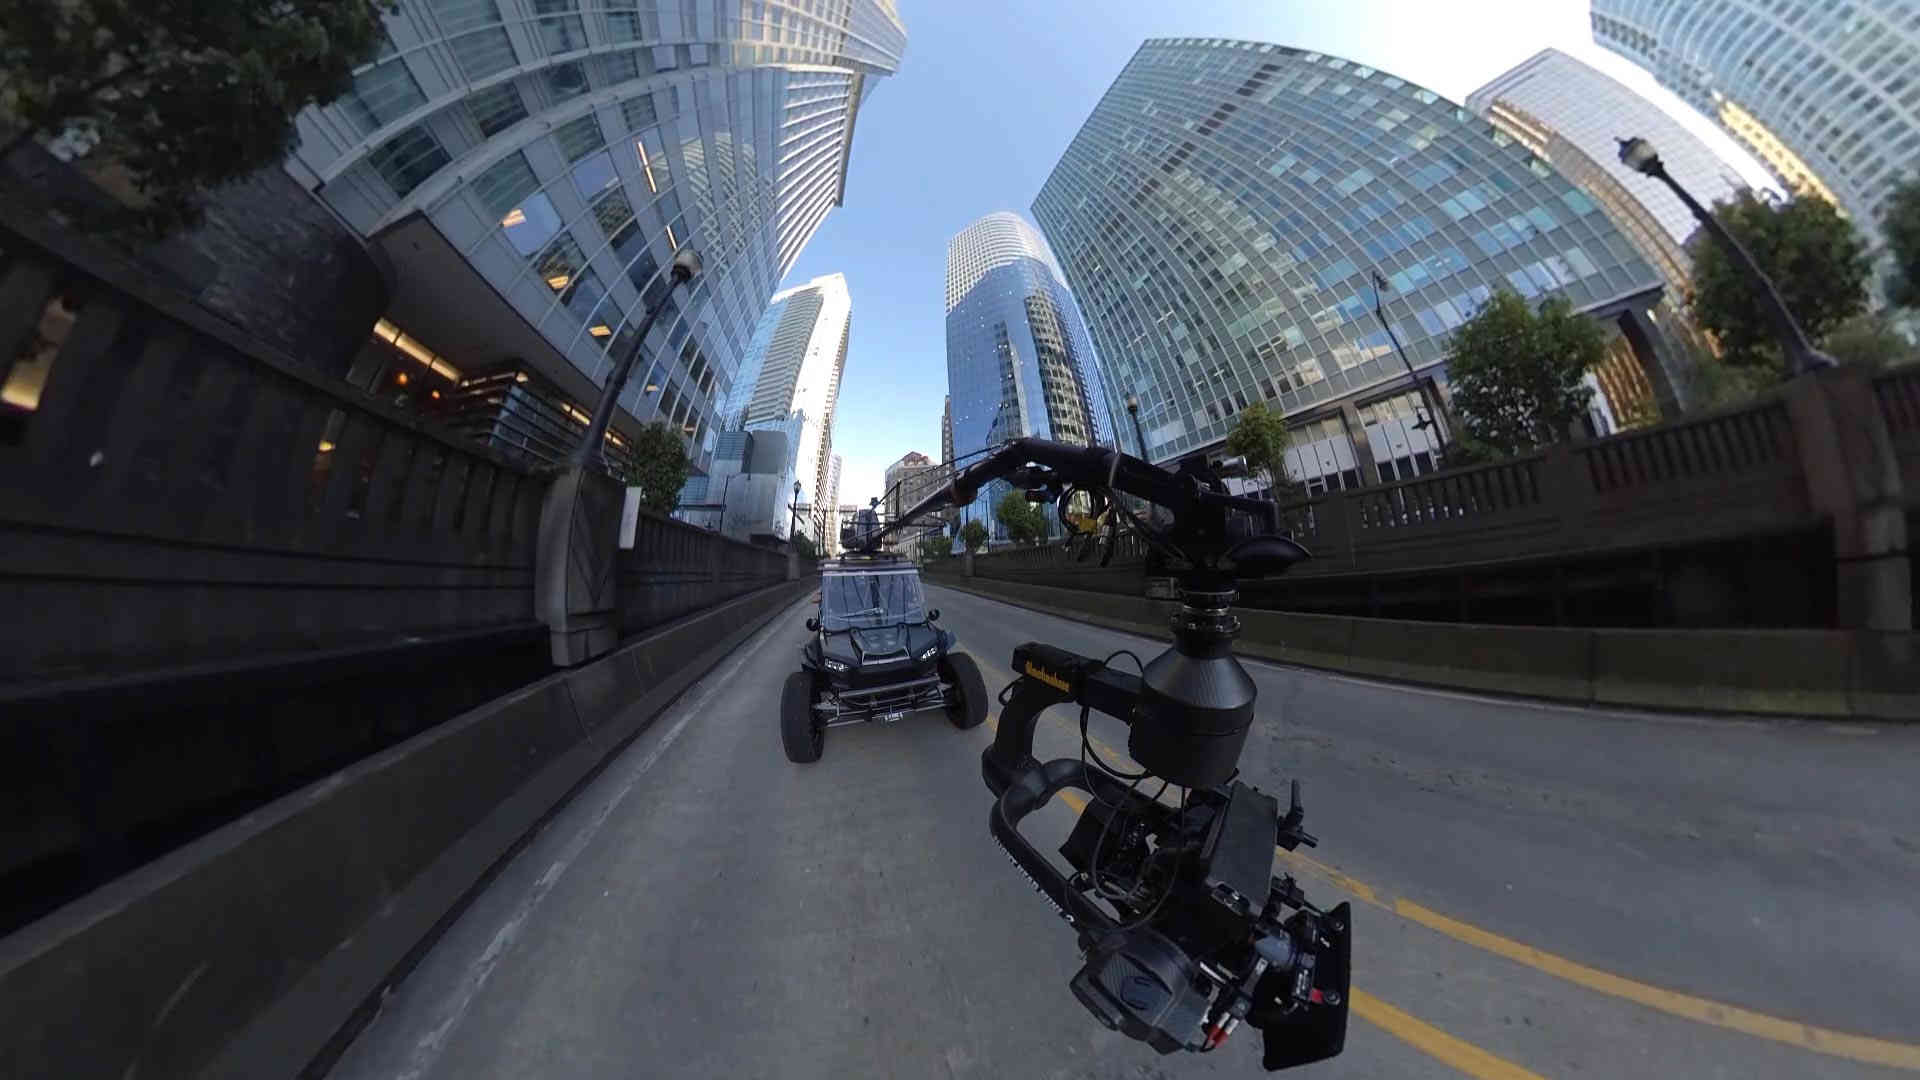 RZR 4x4 Downtown Vancouver